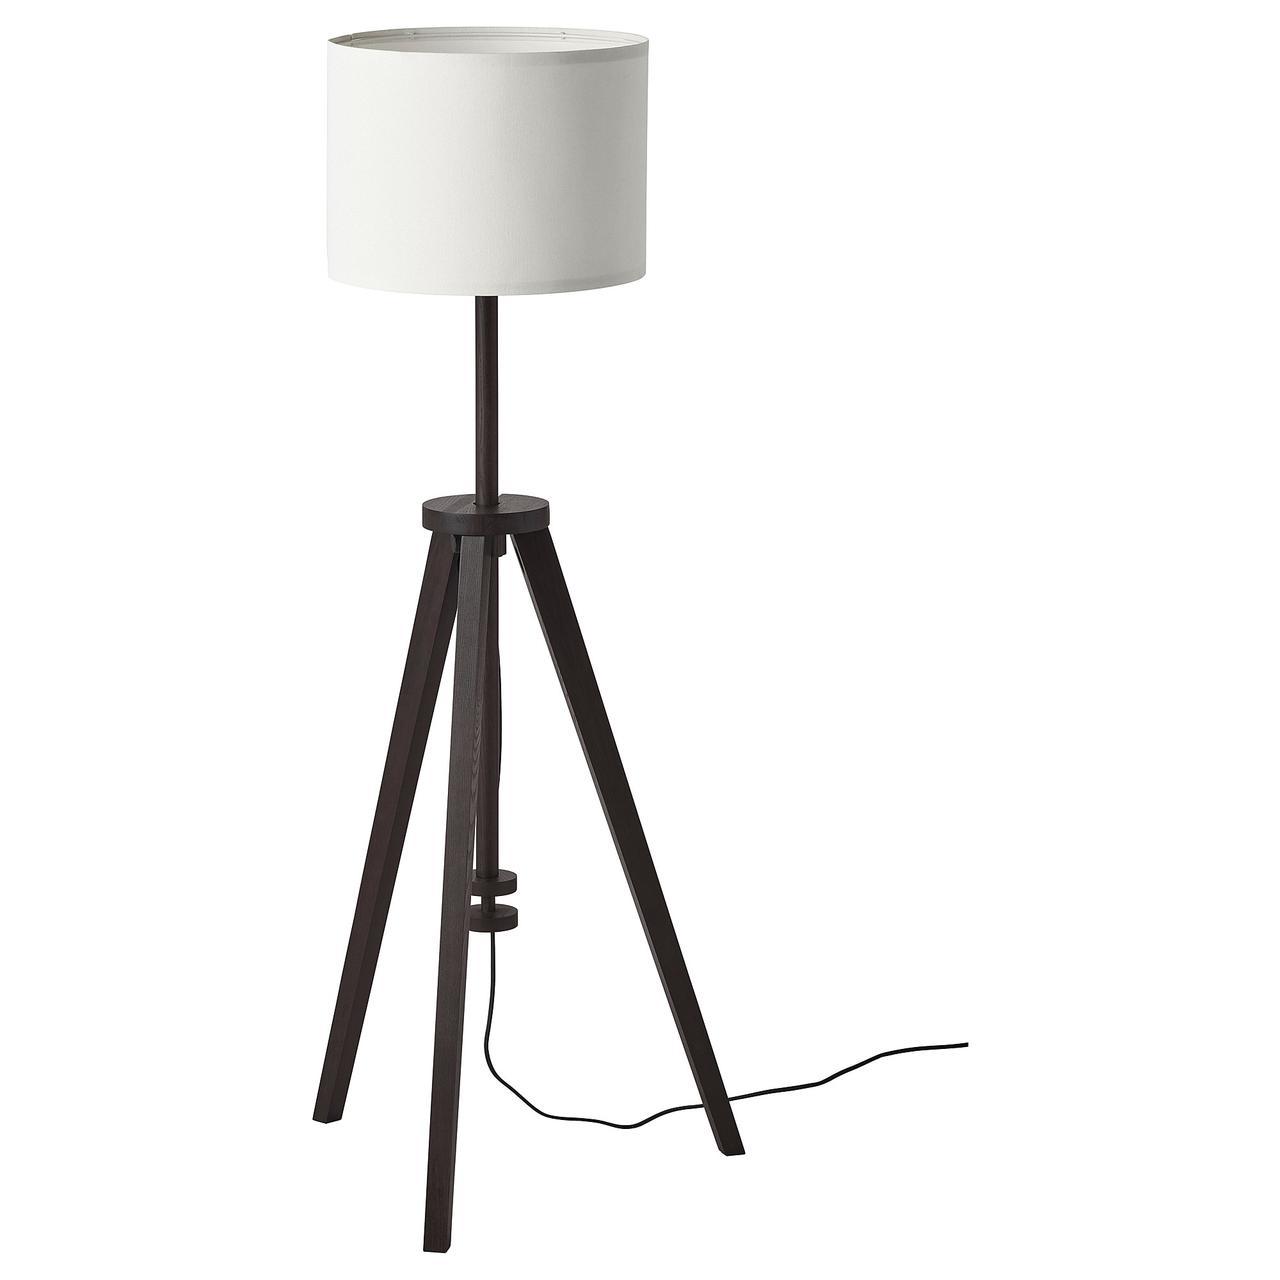 Торшер IKEA  LAUTERS коричневый ясень, белый 804.050.73